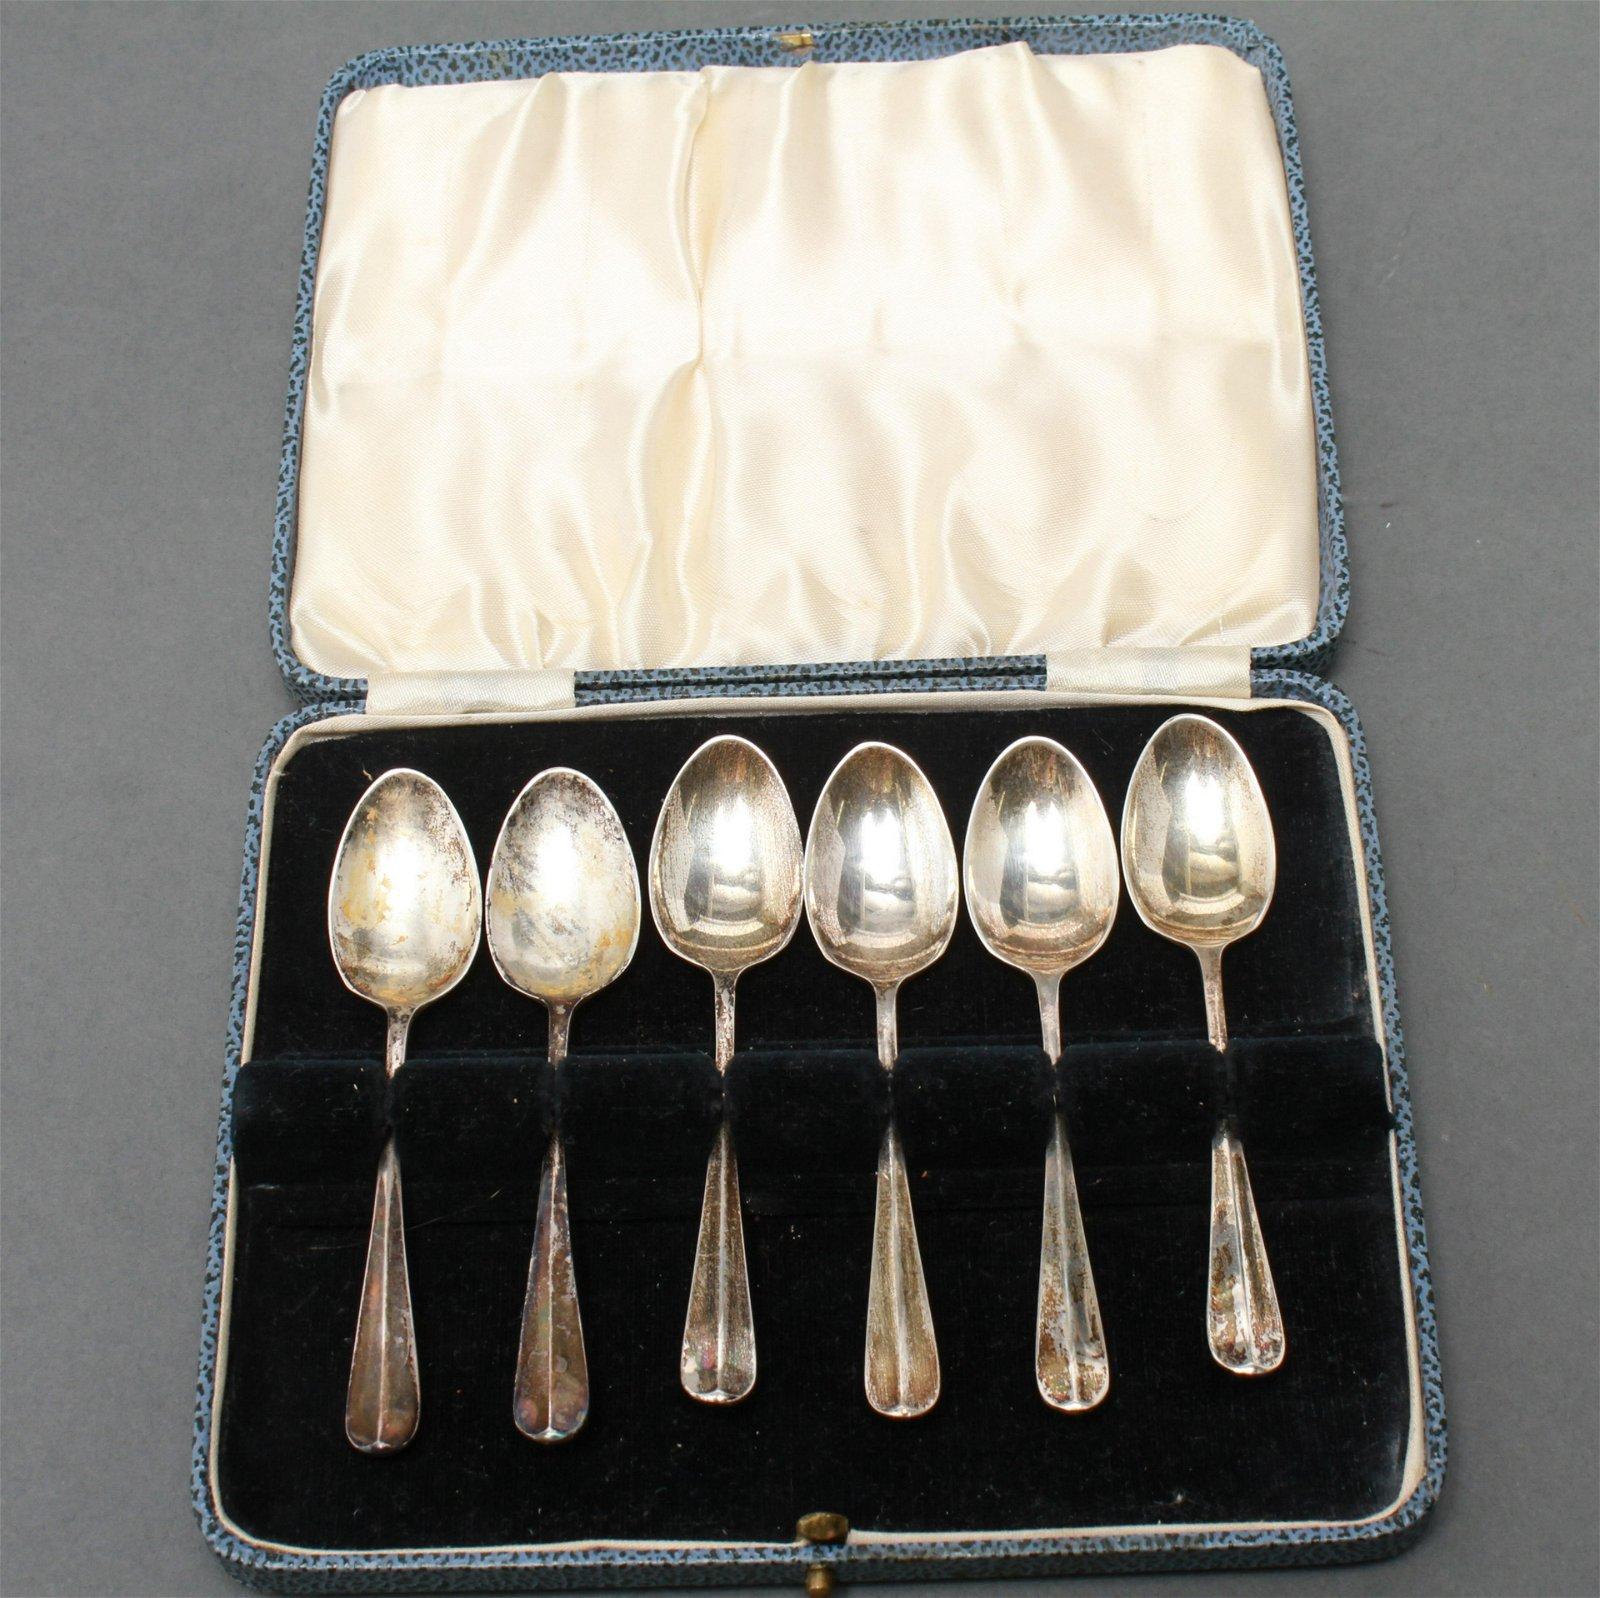 Sheffield English Silver Demitasse Spoons, 6 Pcs.